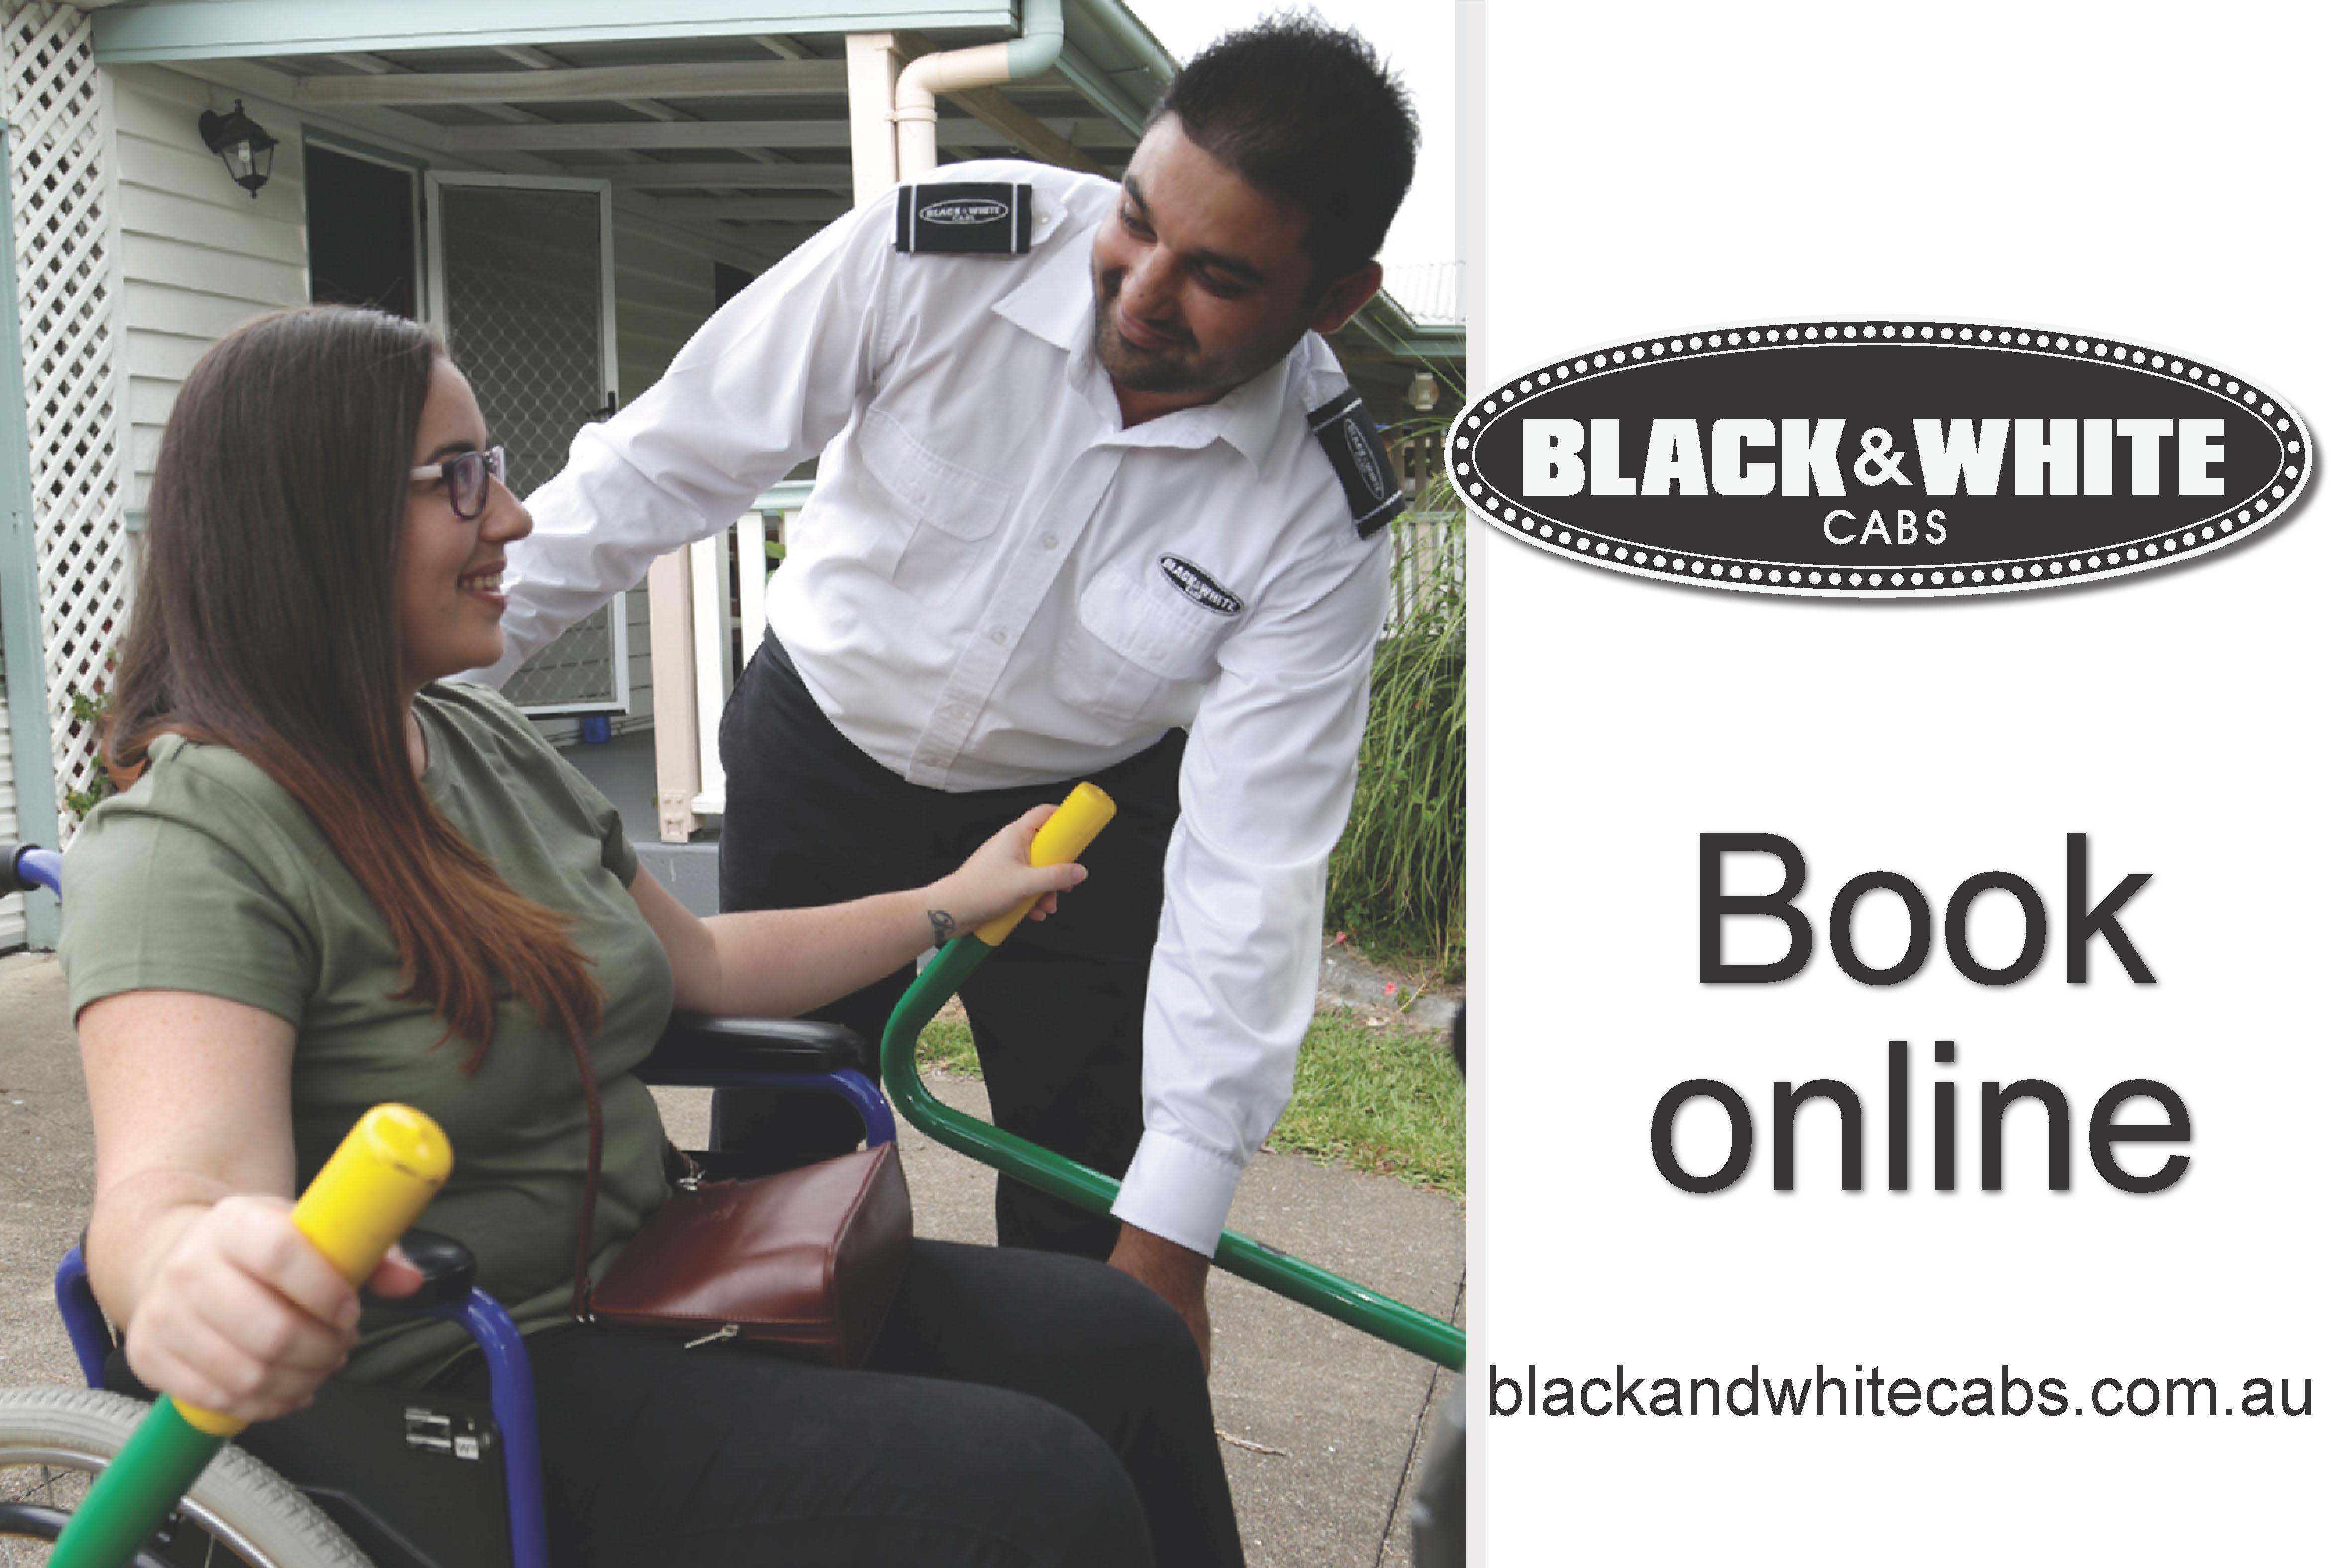 Black n white cabs brisbane